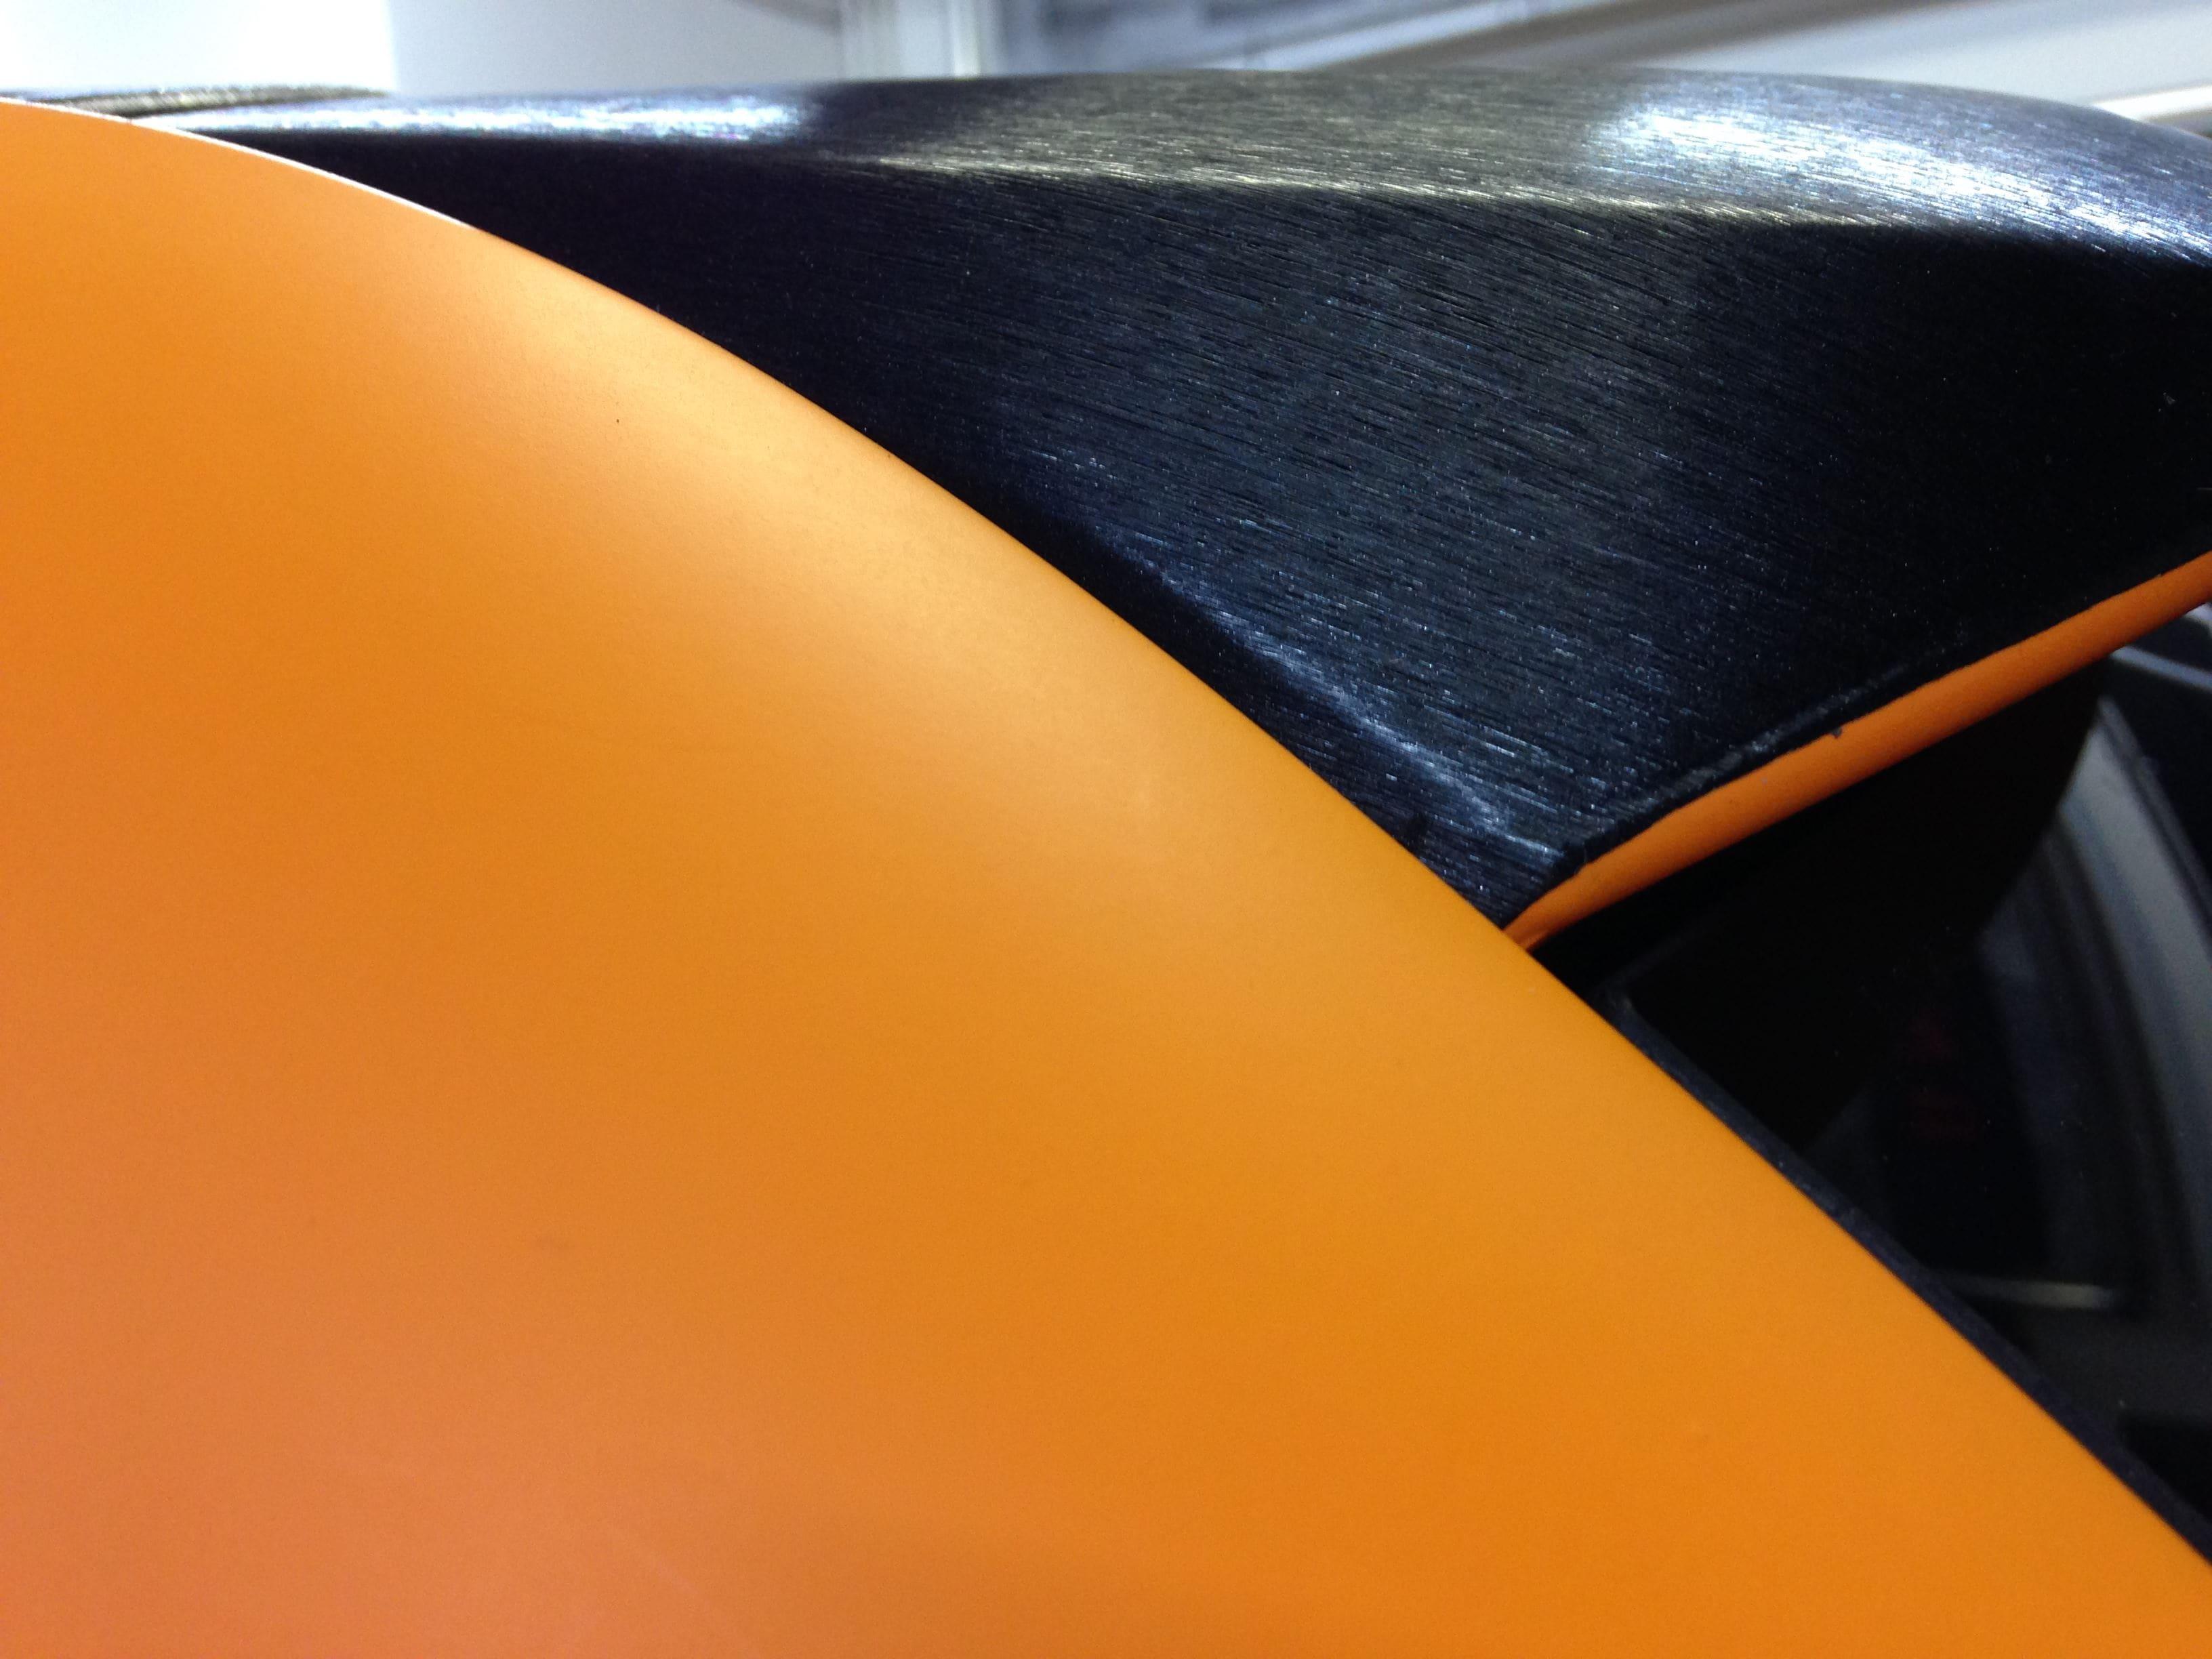 Volkswagen Touareg met Mat Oranje Wrap, Carwrapping door Wrapmyride.nu Foto-nr:7386, ©2020